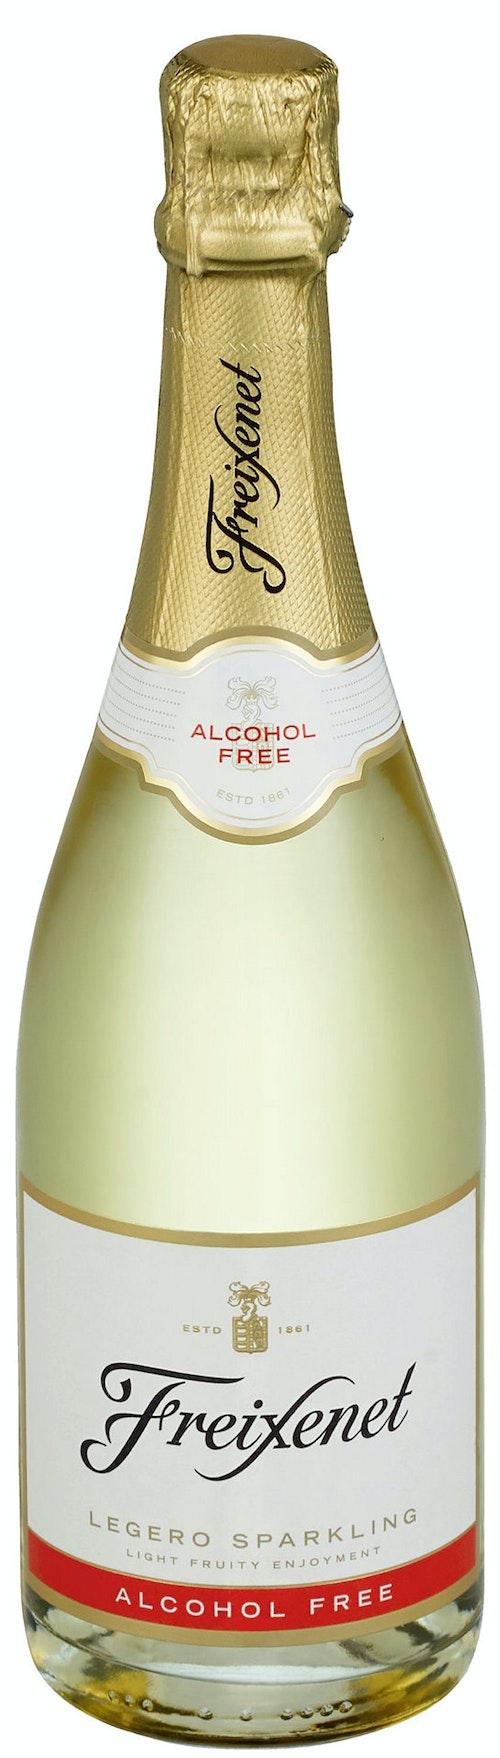 Freixenet Cava Alkoholfri, 750 ml